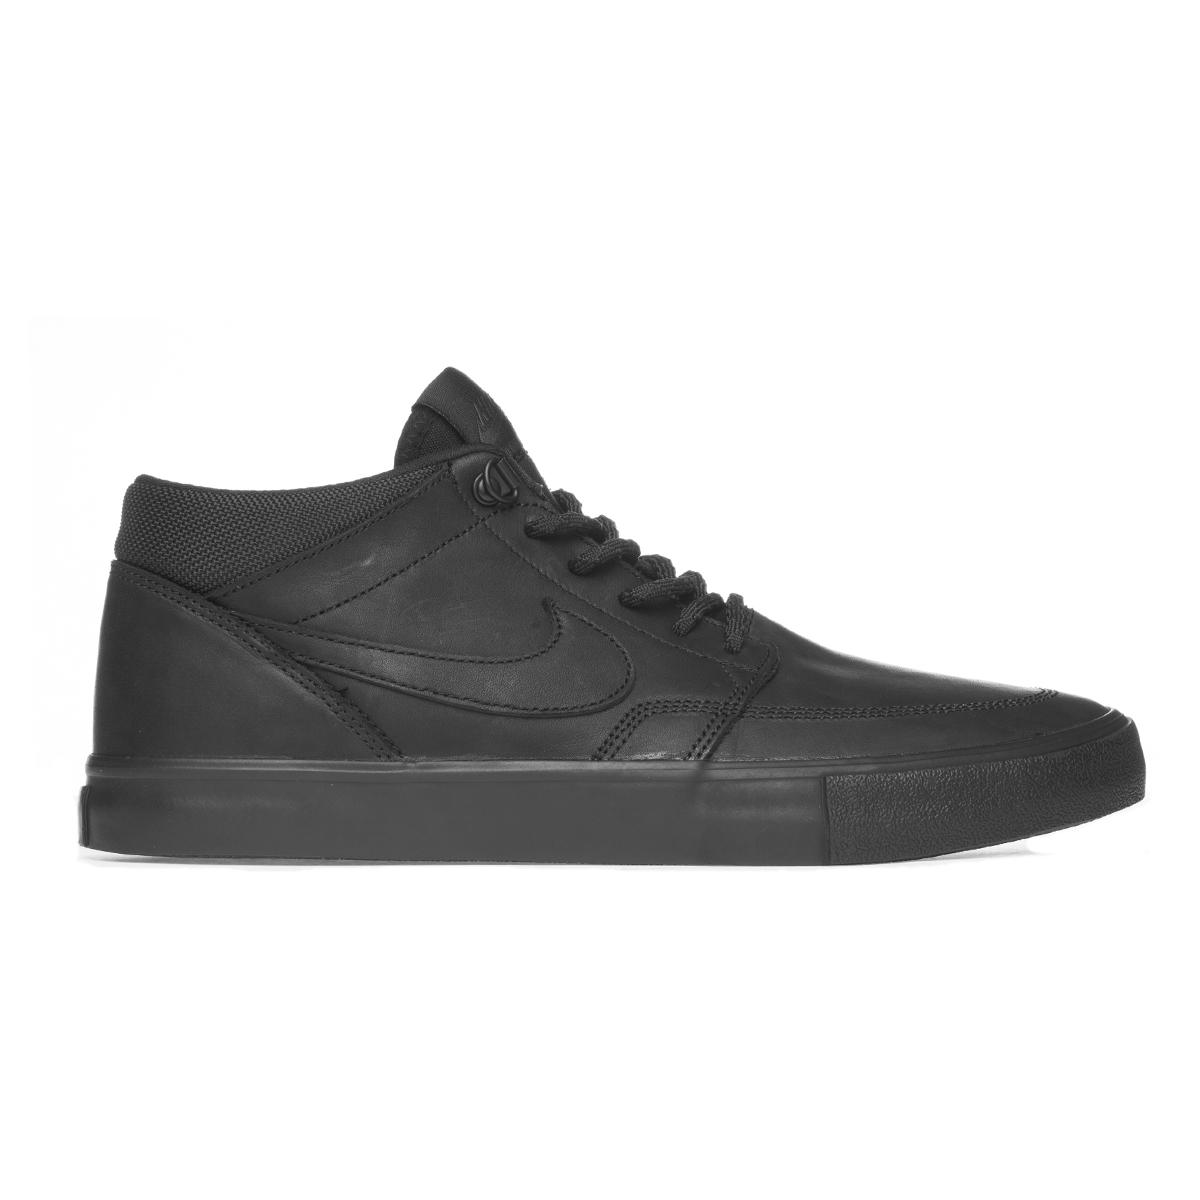 Buty Nike SB Portmore II Mid Black / Black-Anthracite